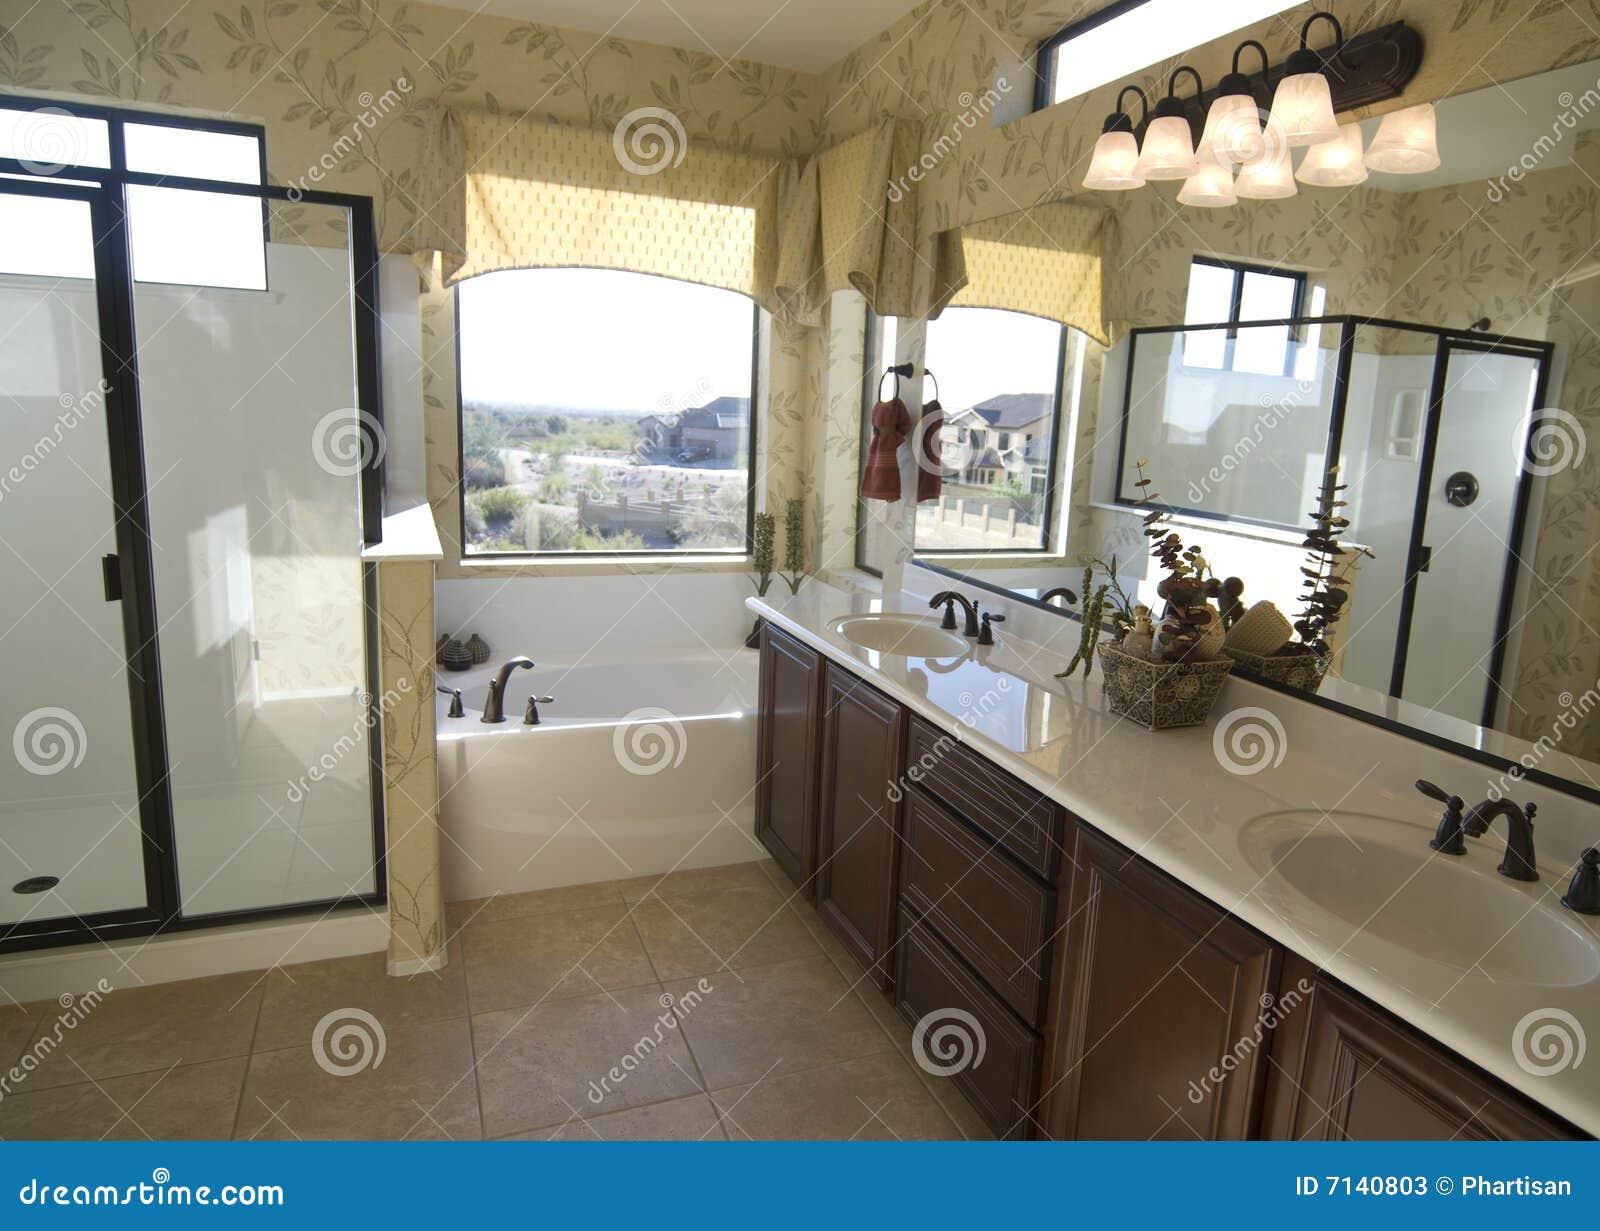 Beautiful new bathroom stock image image of indoor real 7140803 - Image of bath room ...